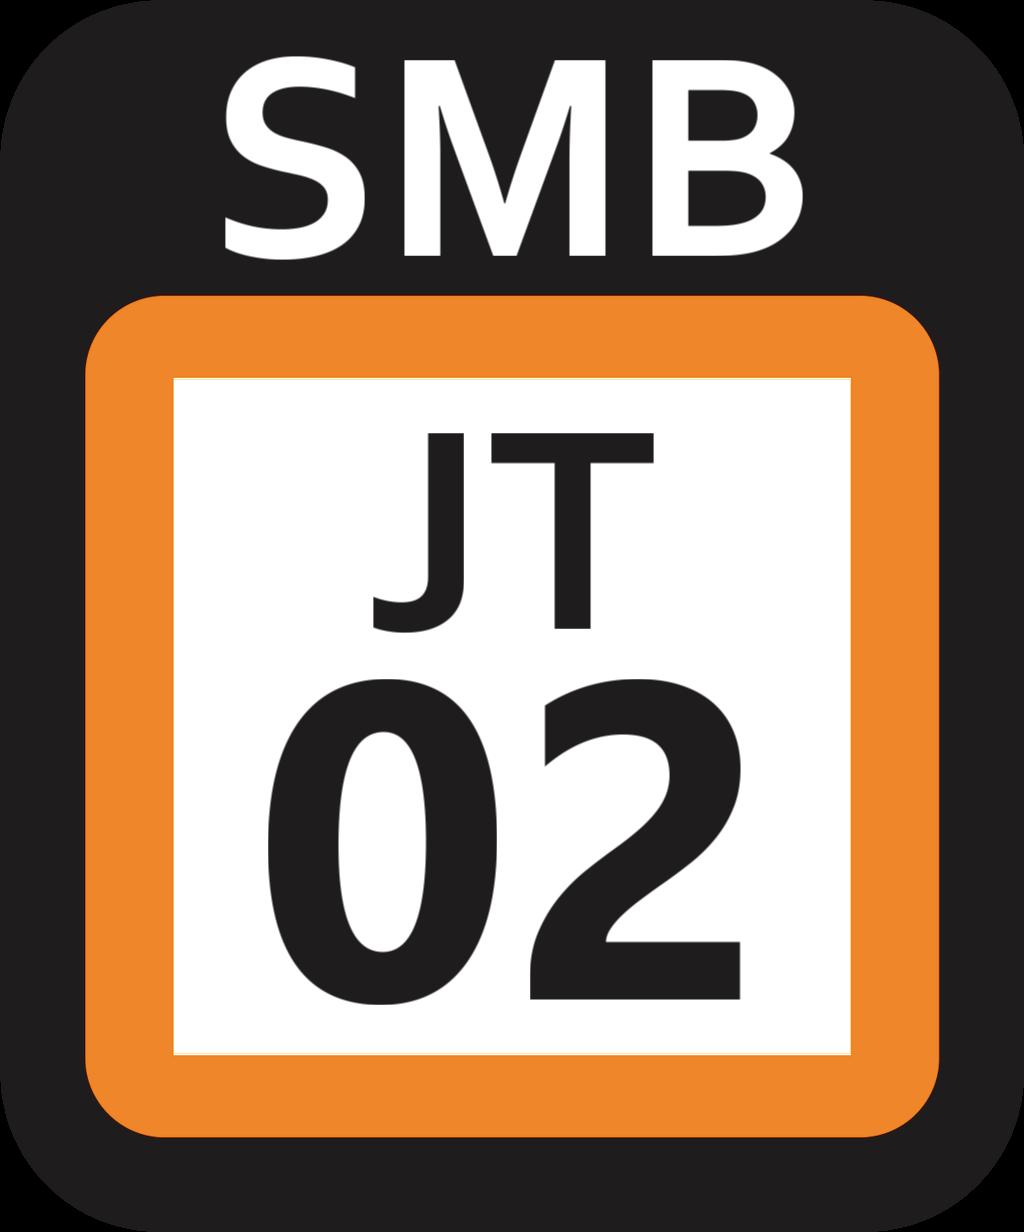 jt 02